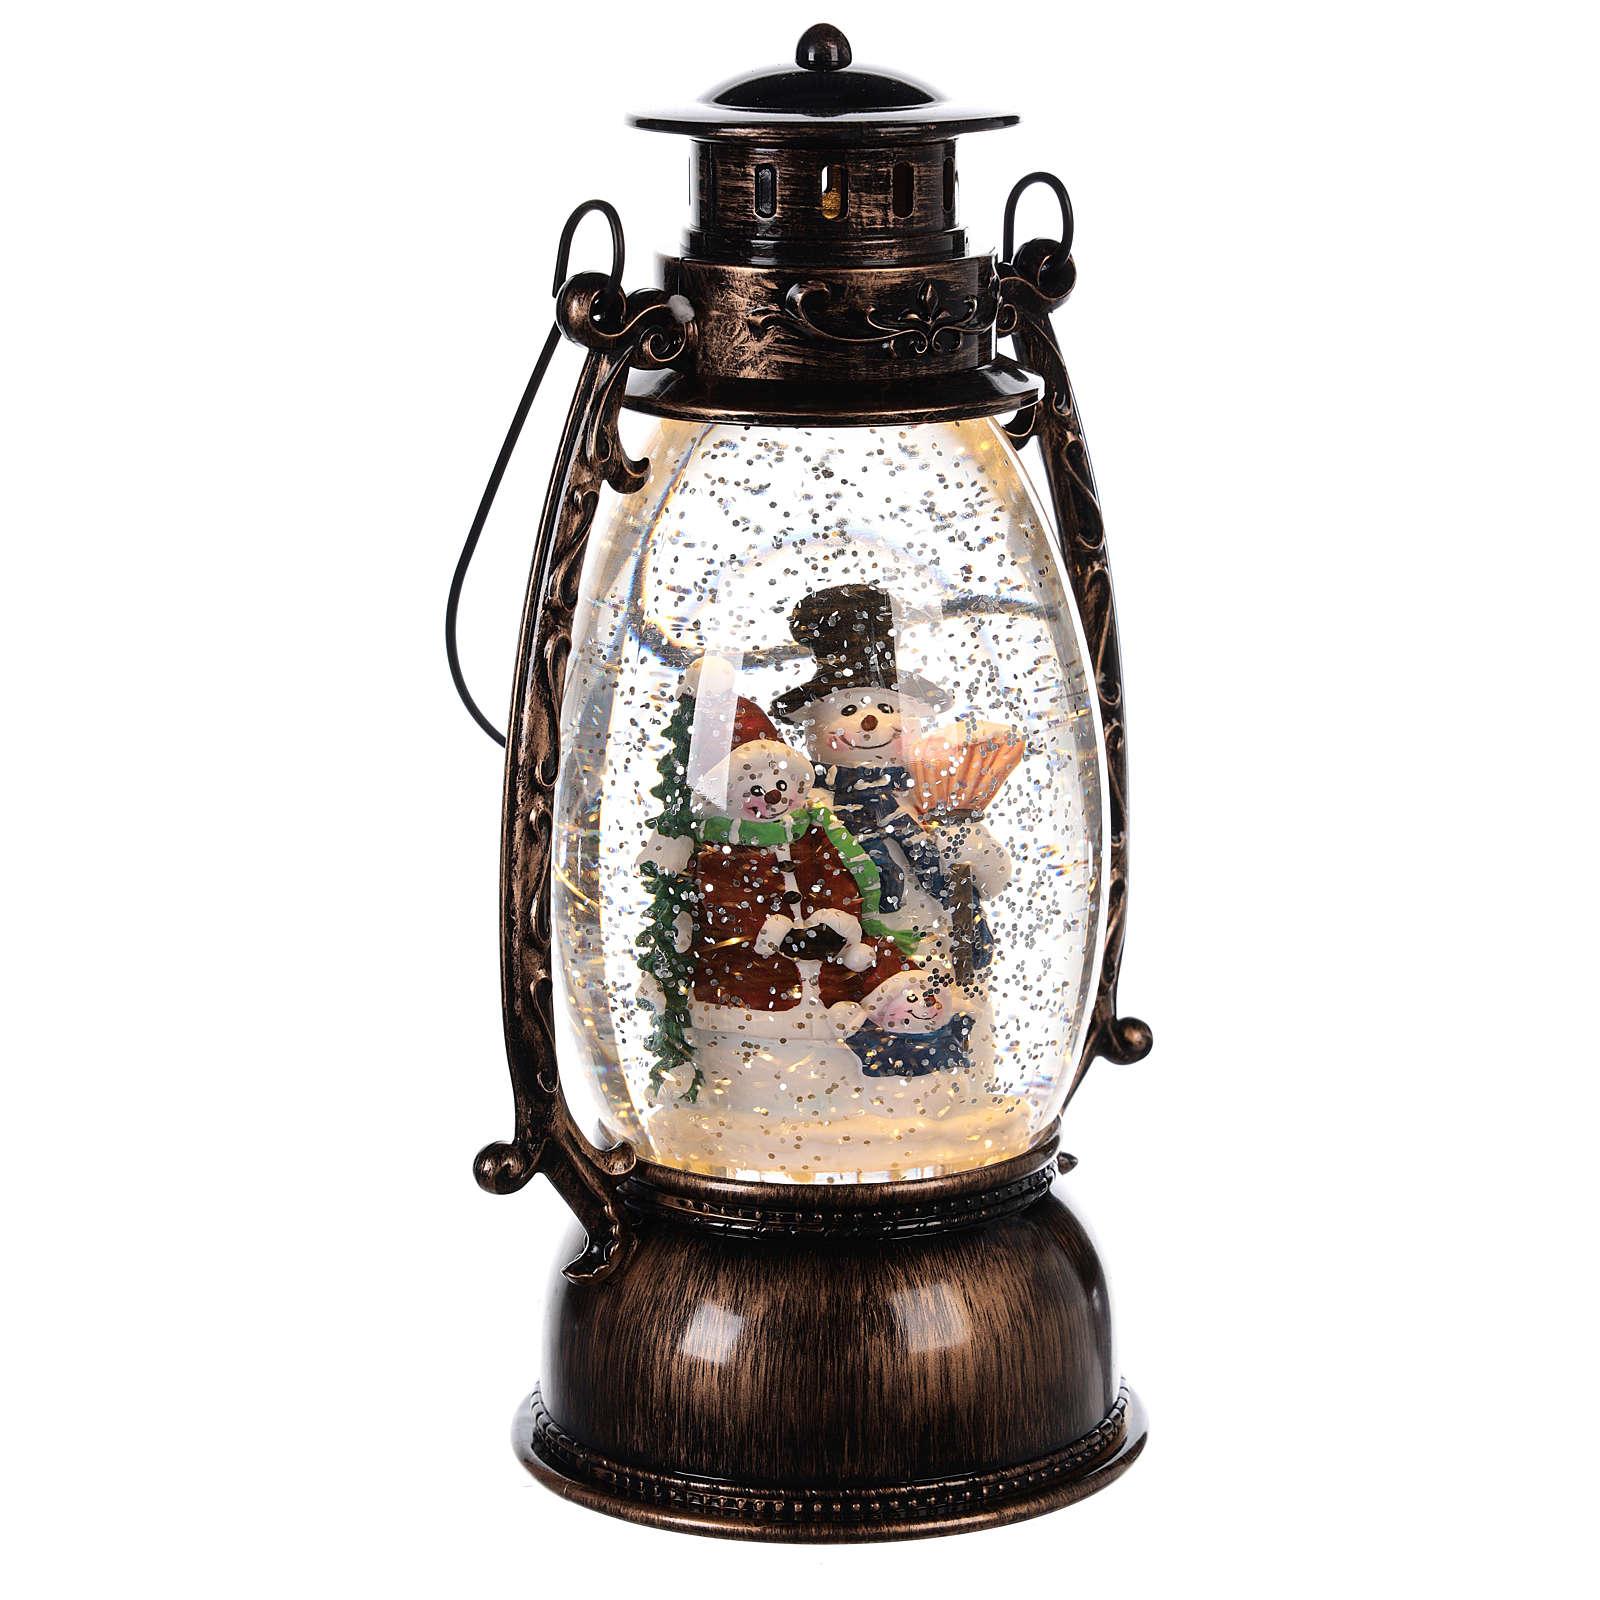 Palla di neve con pupazzi di neve in lanterna 25x10 cm 3